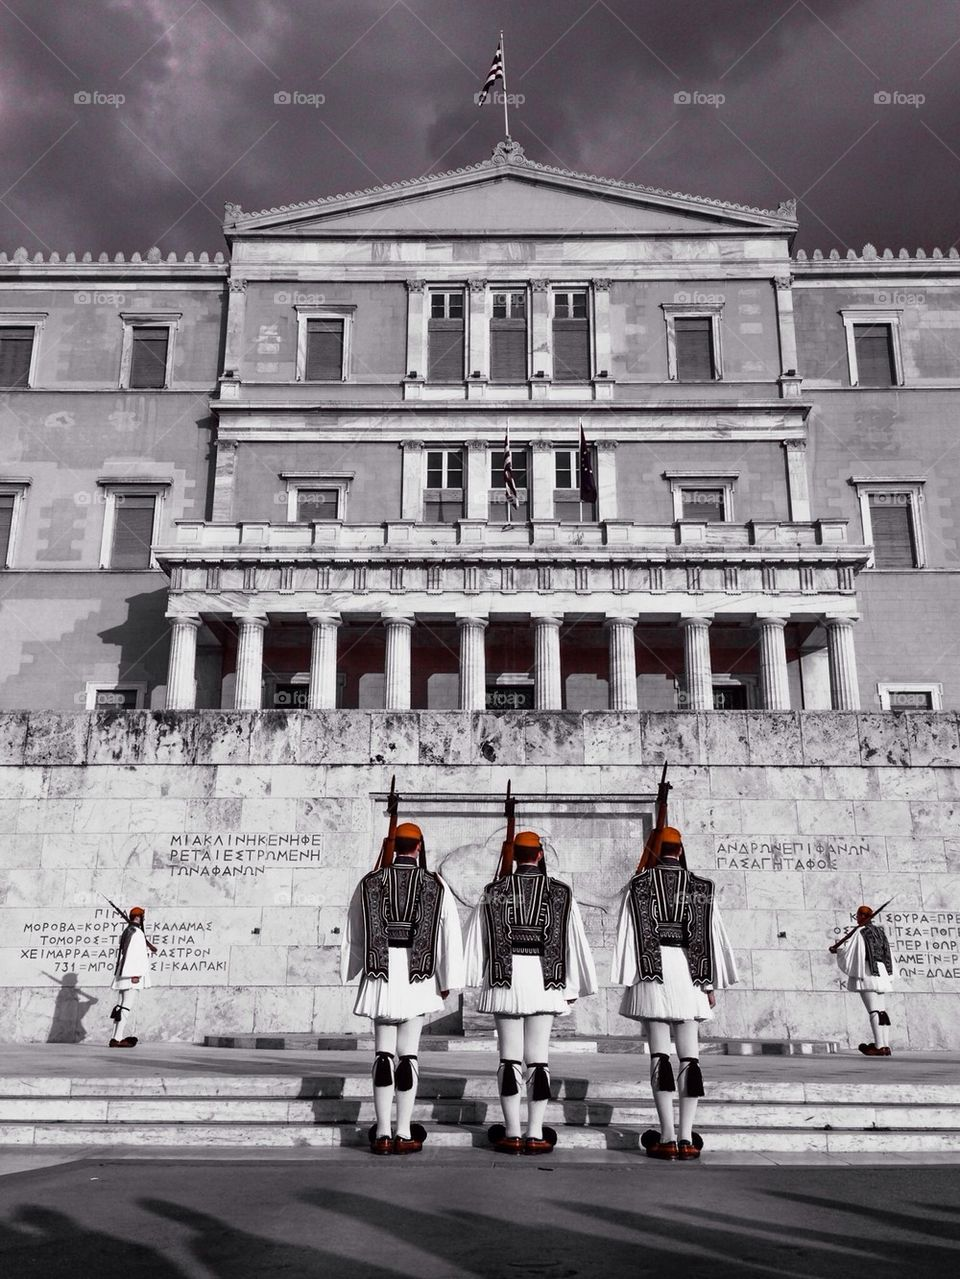 Parliamentary guards